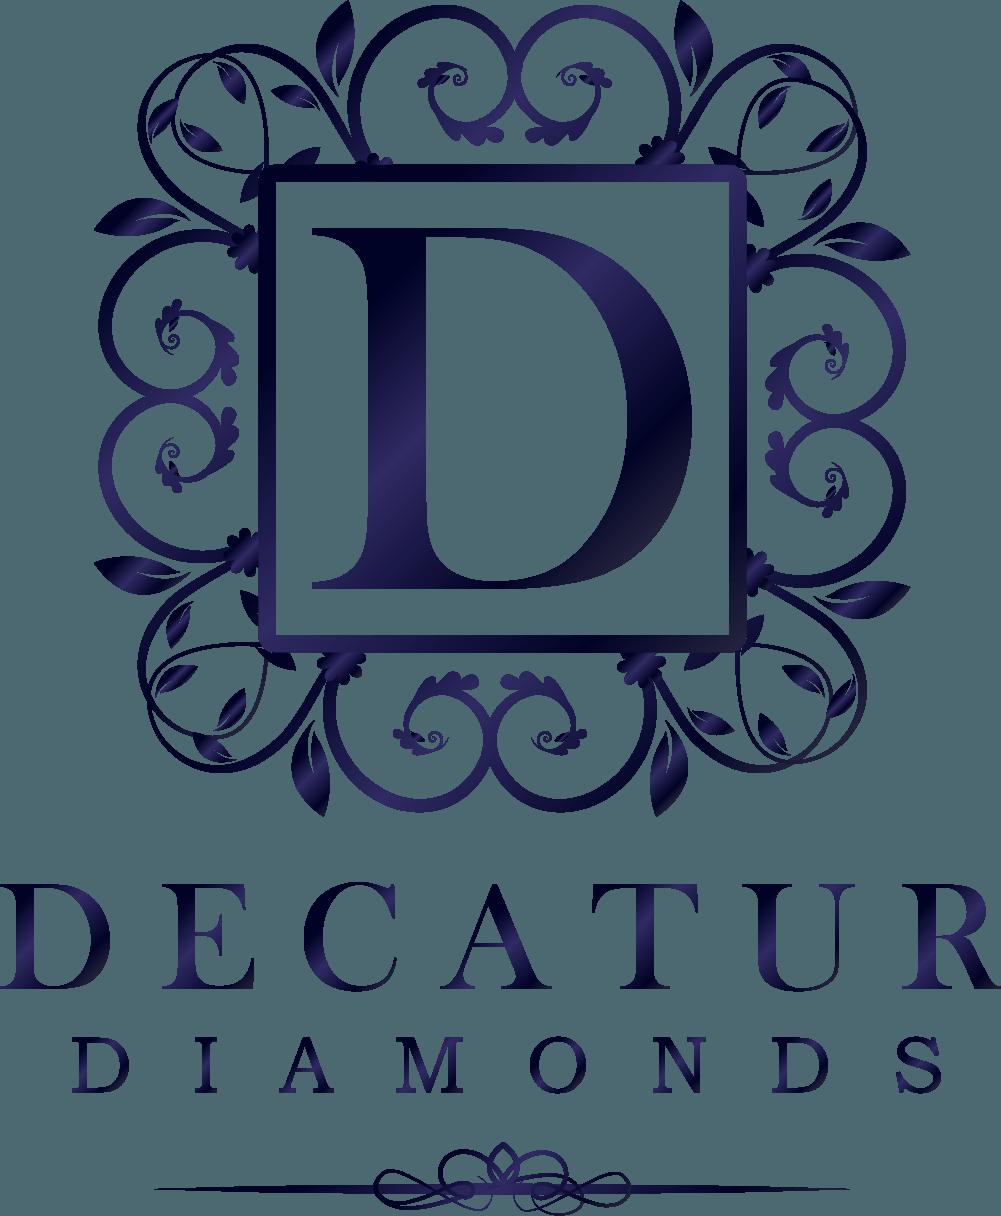 Decatur Diamonds